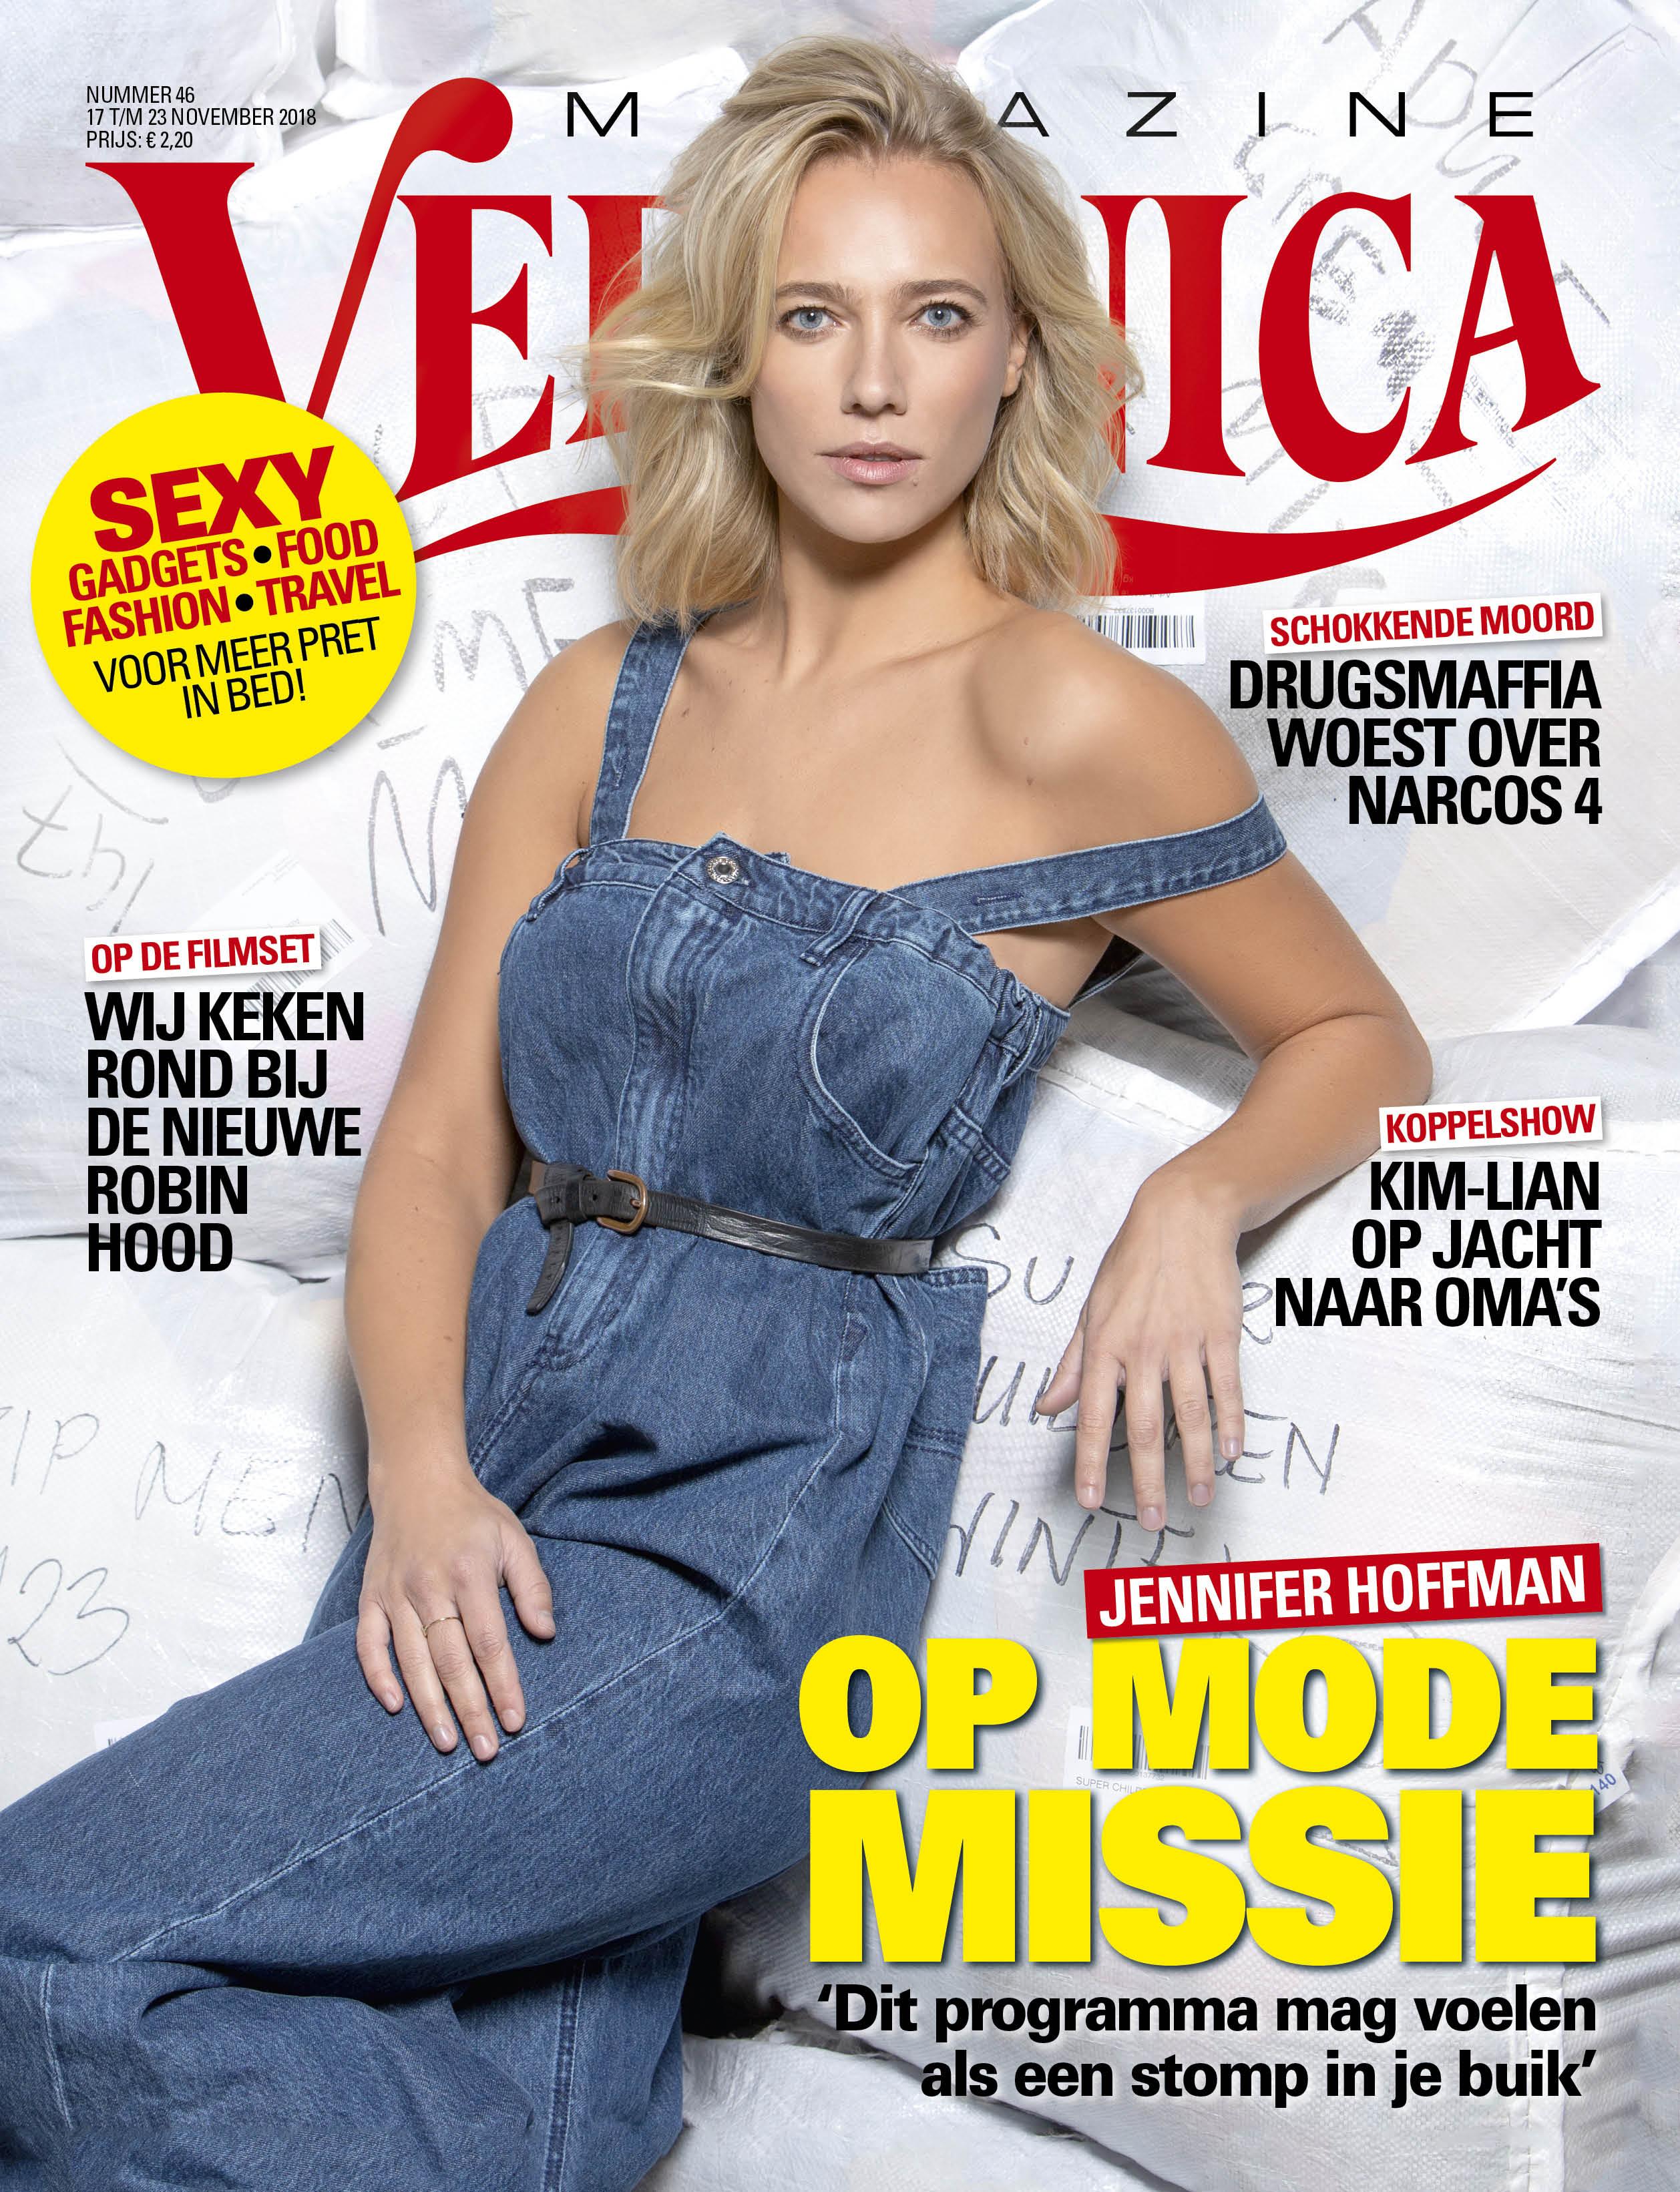 Photoshoot Jennifer Hofman Veronica Magazine Bij Wieland Textiles BV !!!